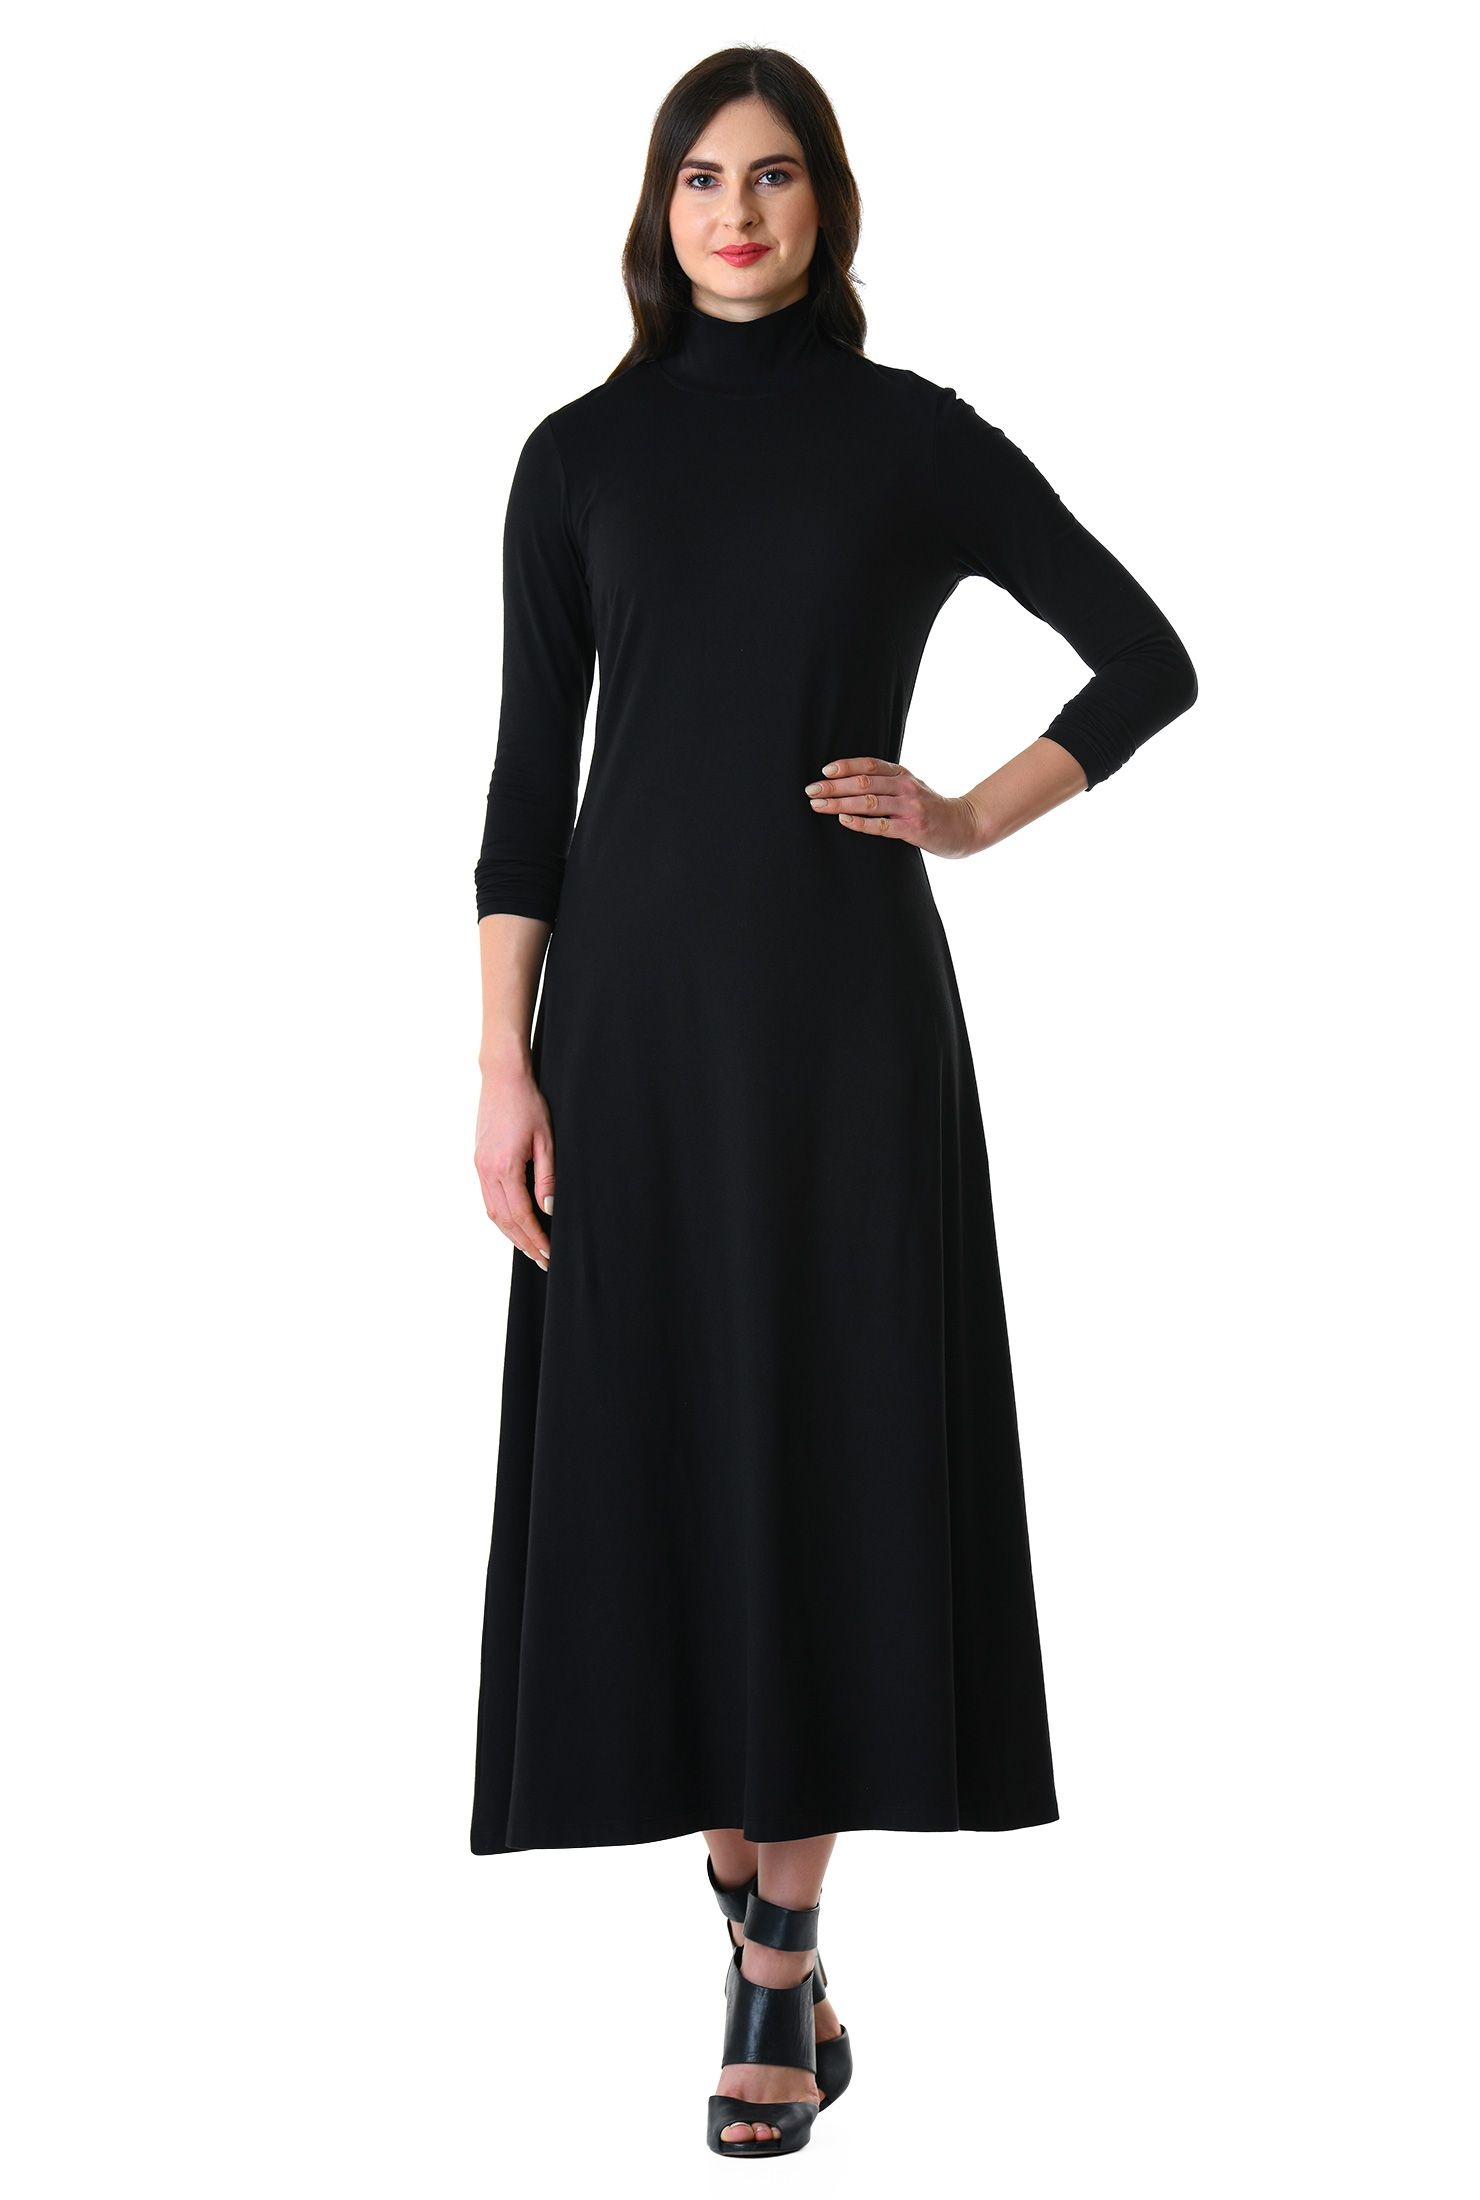 Turtleneck cotton knit midi dress